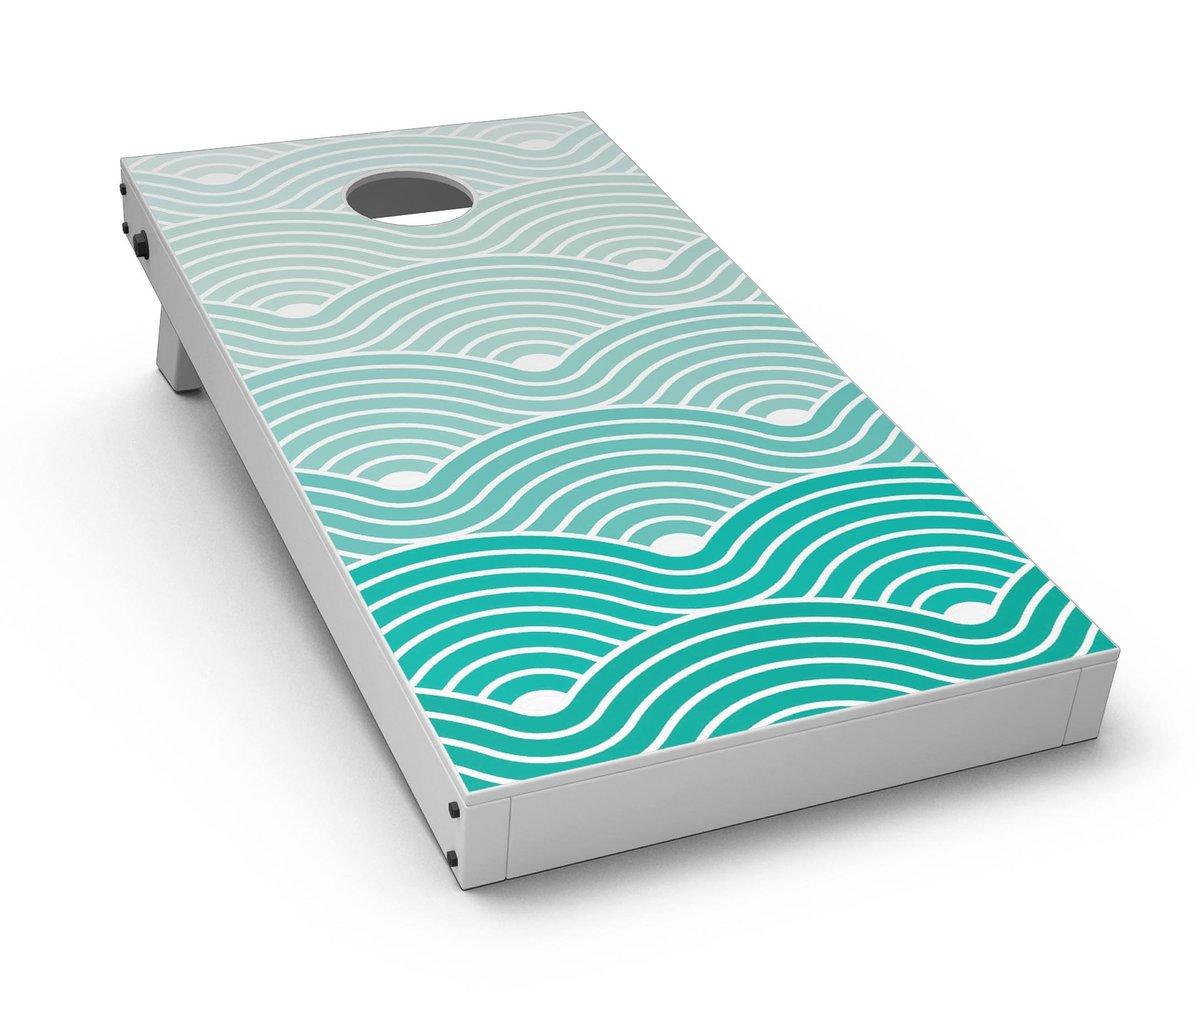 Beach Hotel Wallpaper Waves CornHole Board Skin Decal Kit 1200x1028